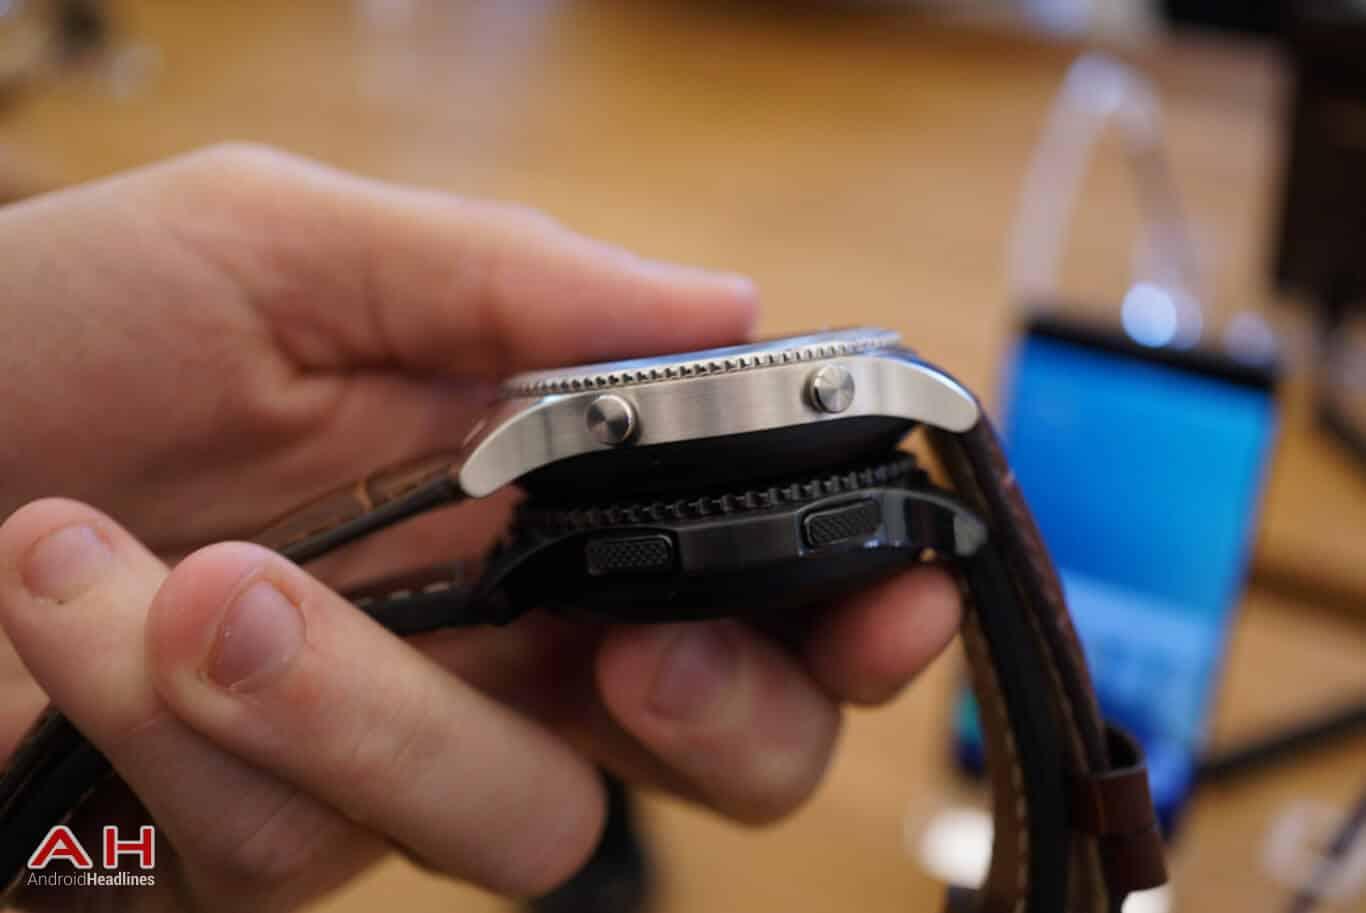 Samsung Gear S3 AH 12